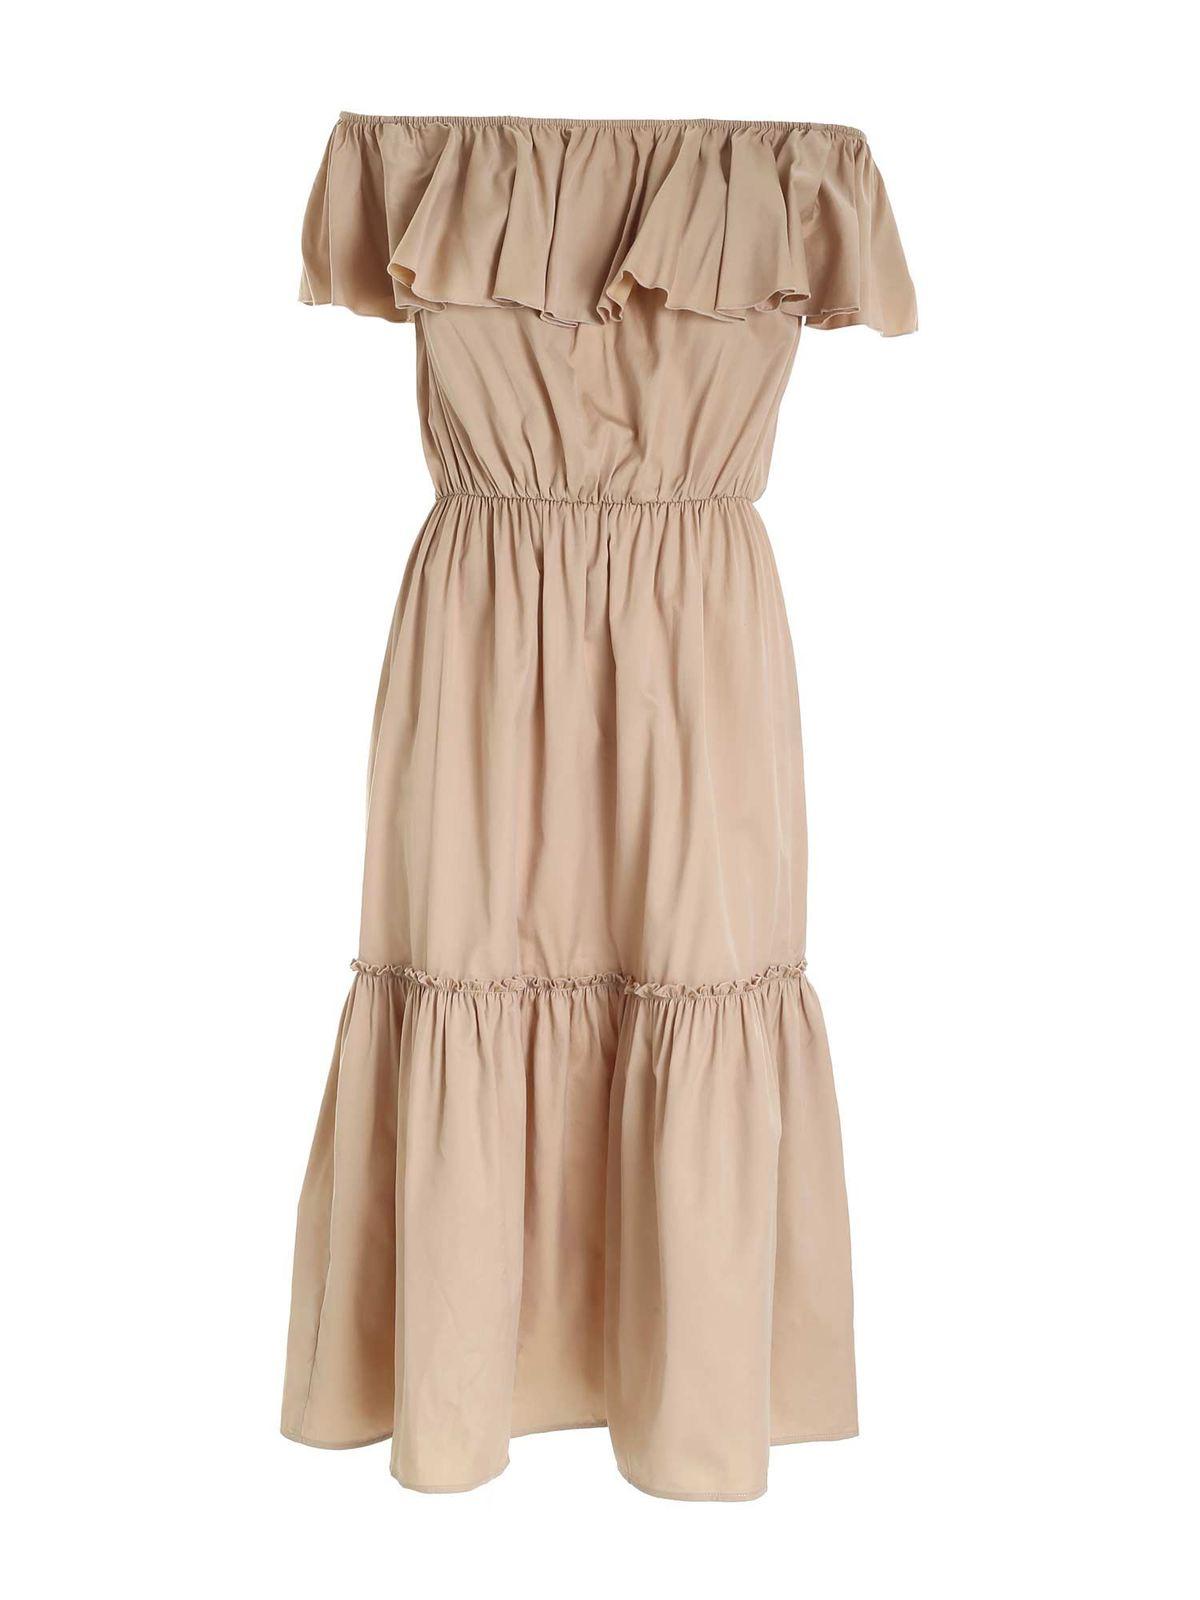 Federica Tosi Dresses RUFFLES LONG DRESS IN BEIGE